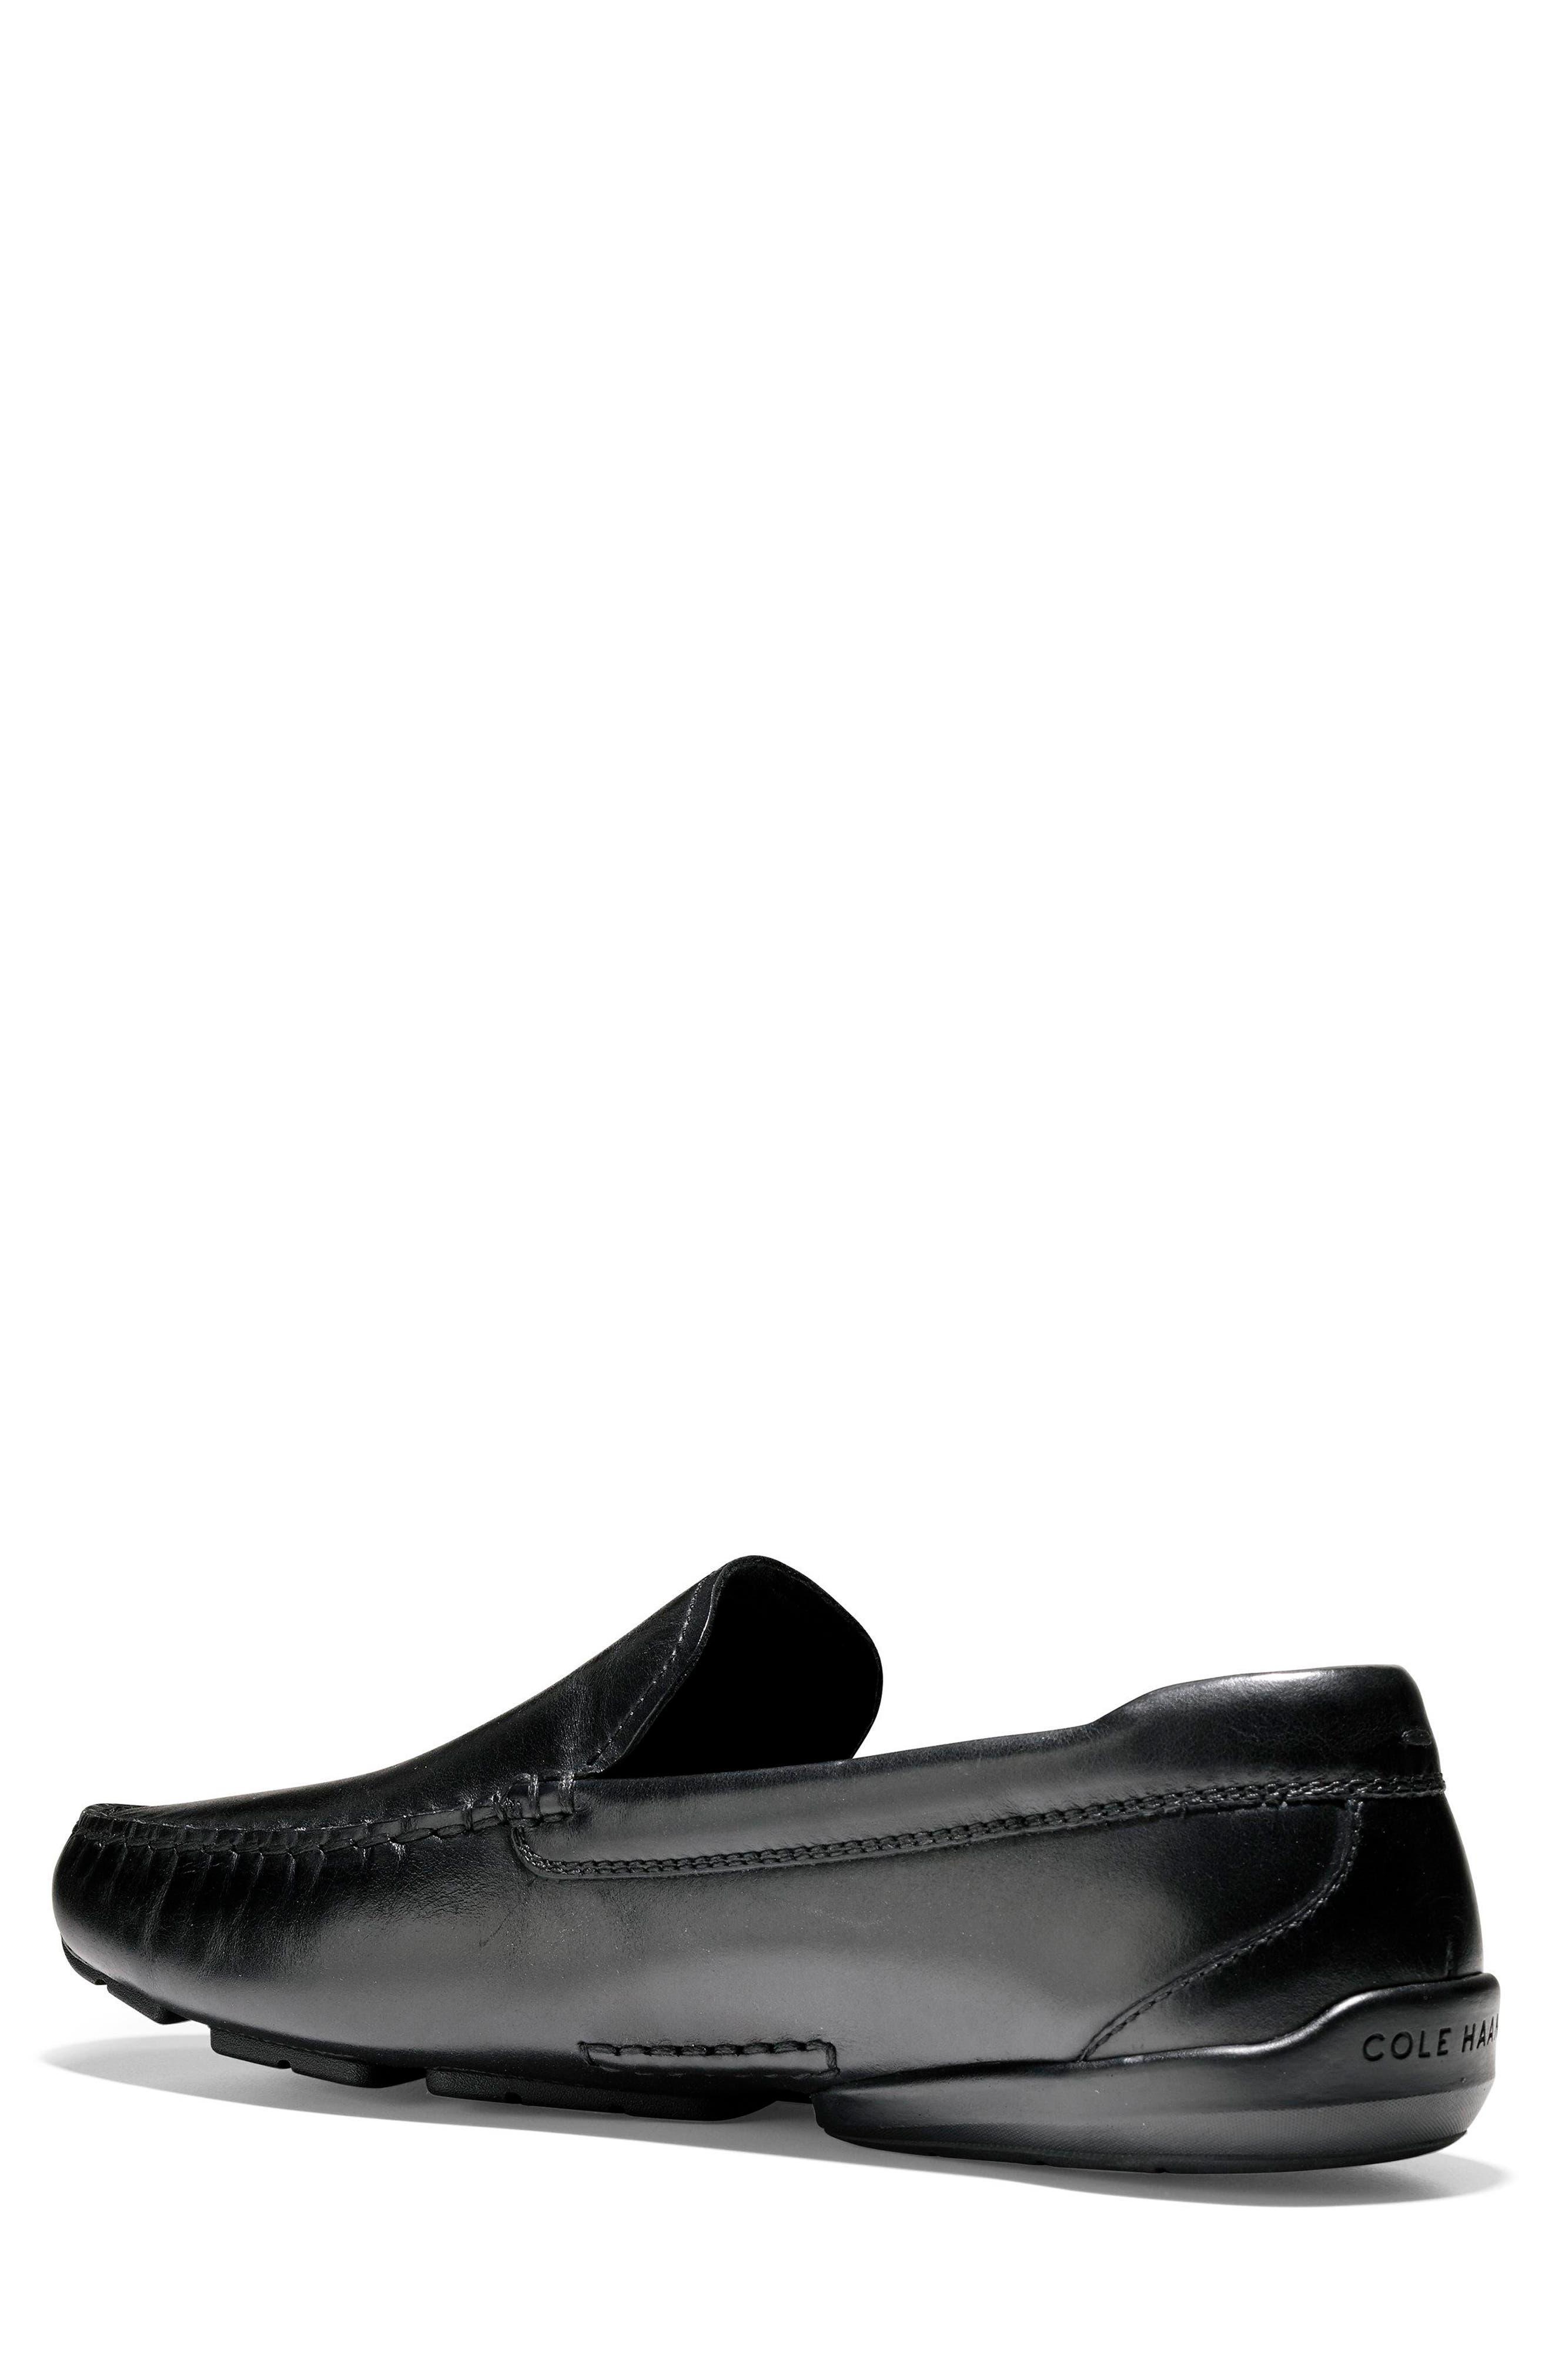 Branson Driving Shoe,                             Alternate thumbnail 2, color,                             Black Leather